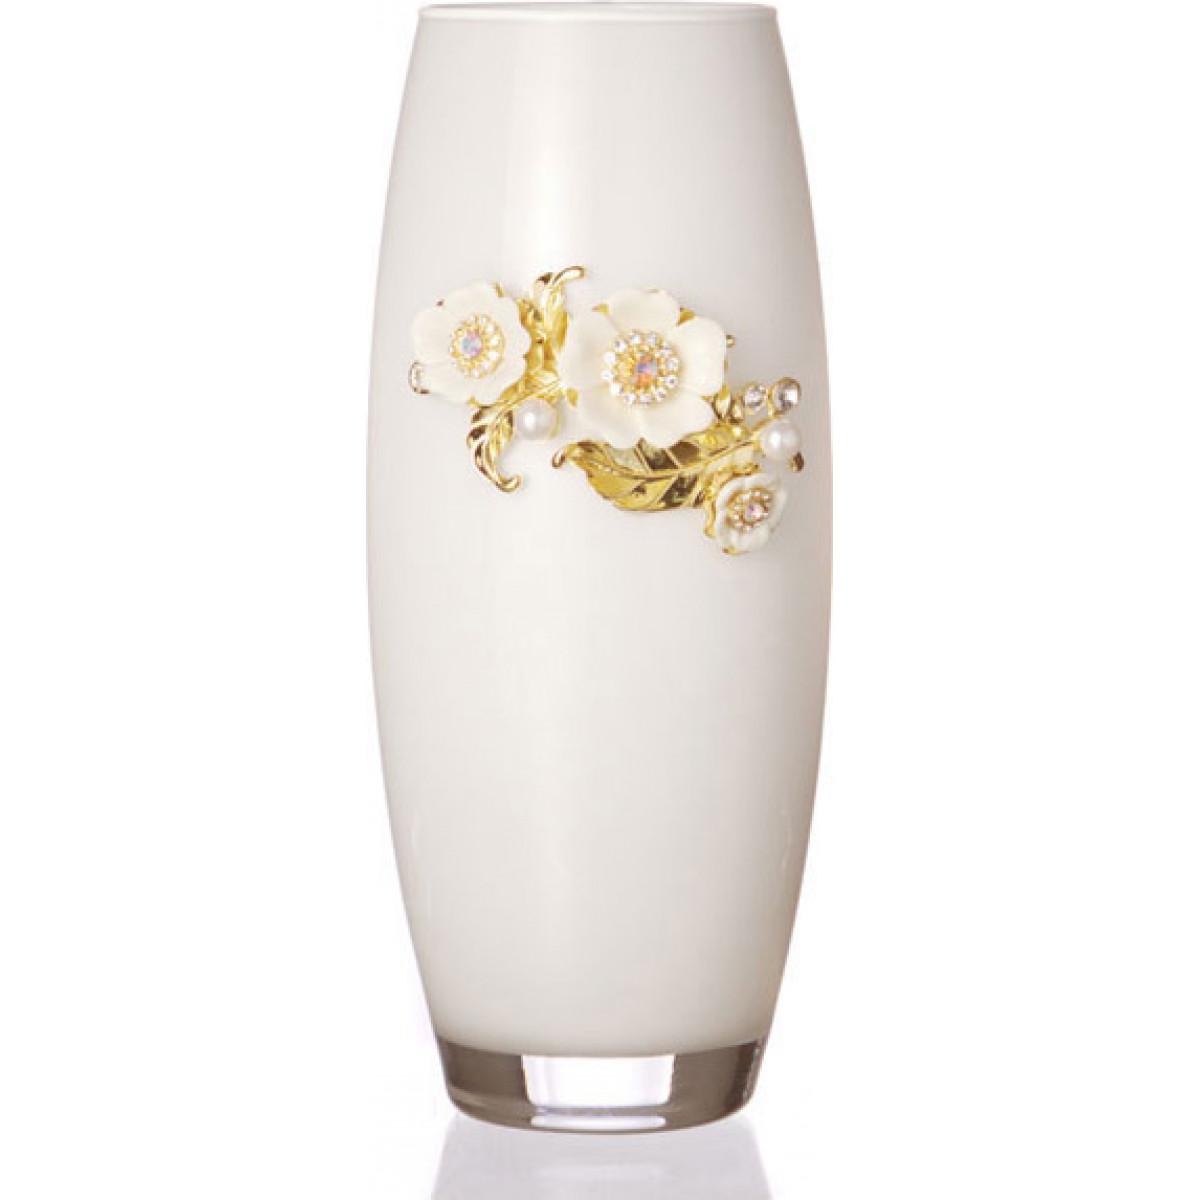 {} Arti-M Ваза Moreen  (26 см) ваза кружева цветов 26 см